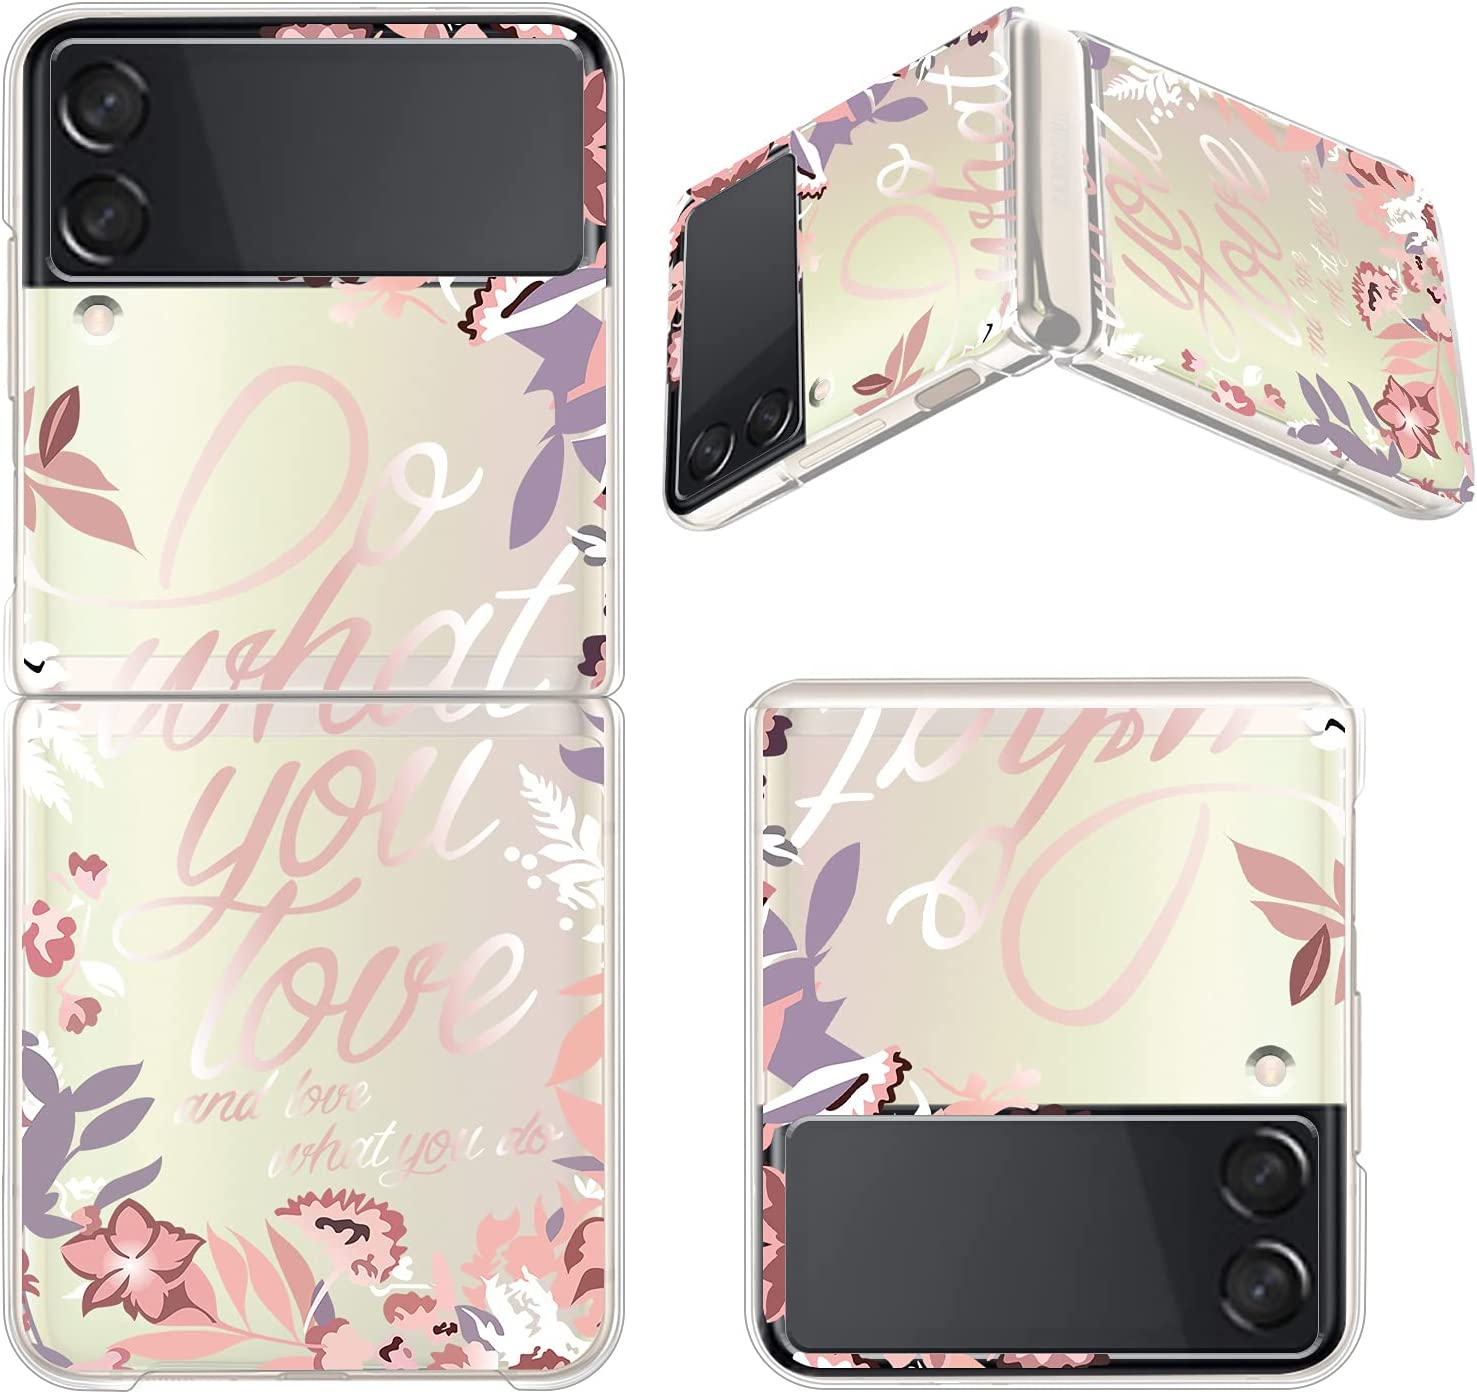 ZIYE Clear Case for Samsung Galaxy Z Flip 3 5G Case Elegant Flower Language Design Shockproof Hard PC Transparent Protective Phone Case for Women Girls Girly Samsung Galaxy Z Flip 3 Case